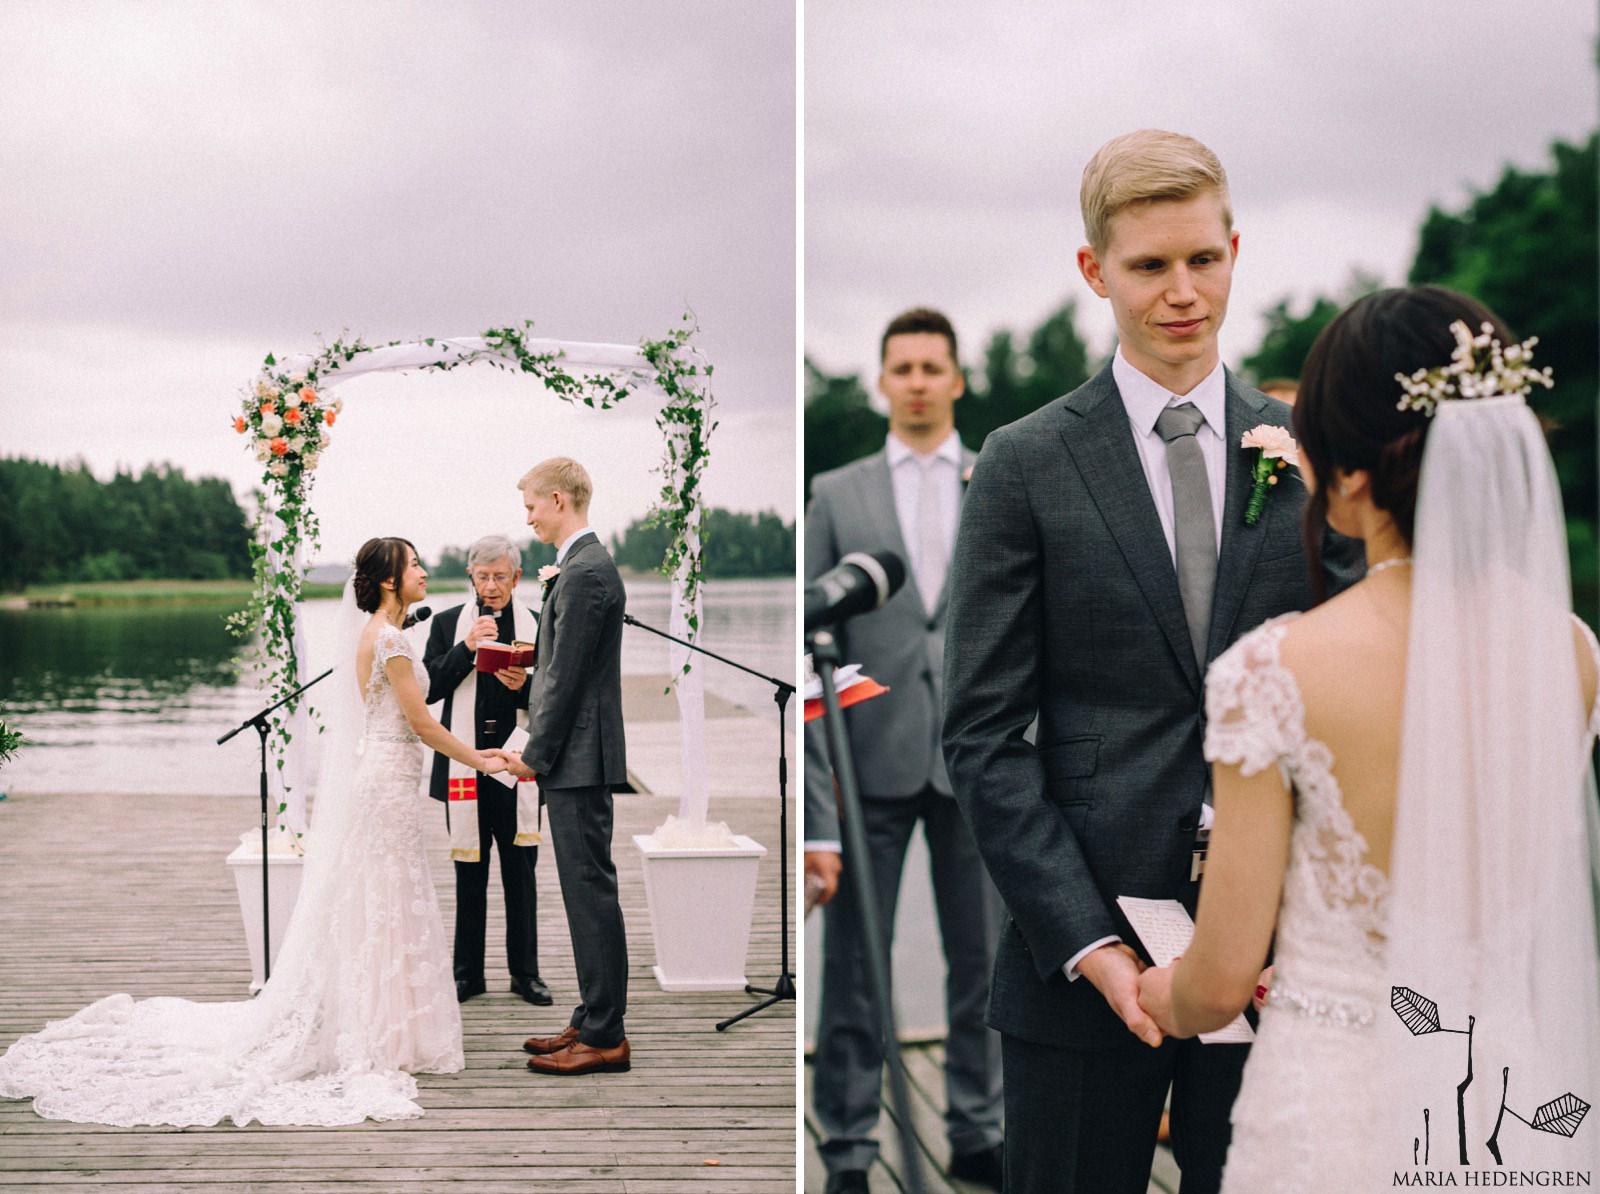 Finnish Vietnamese wedding